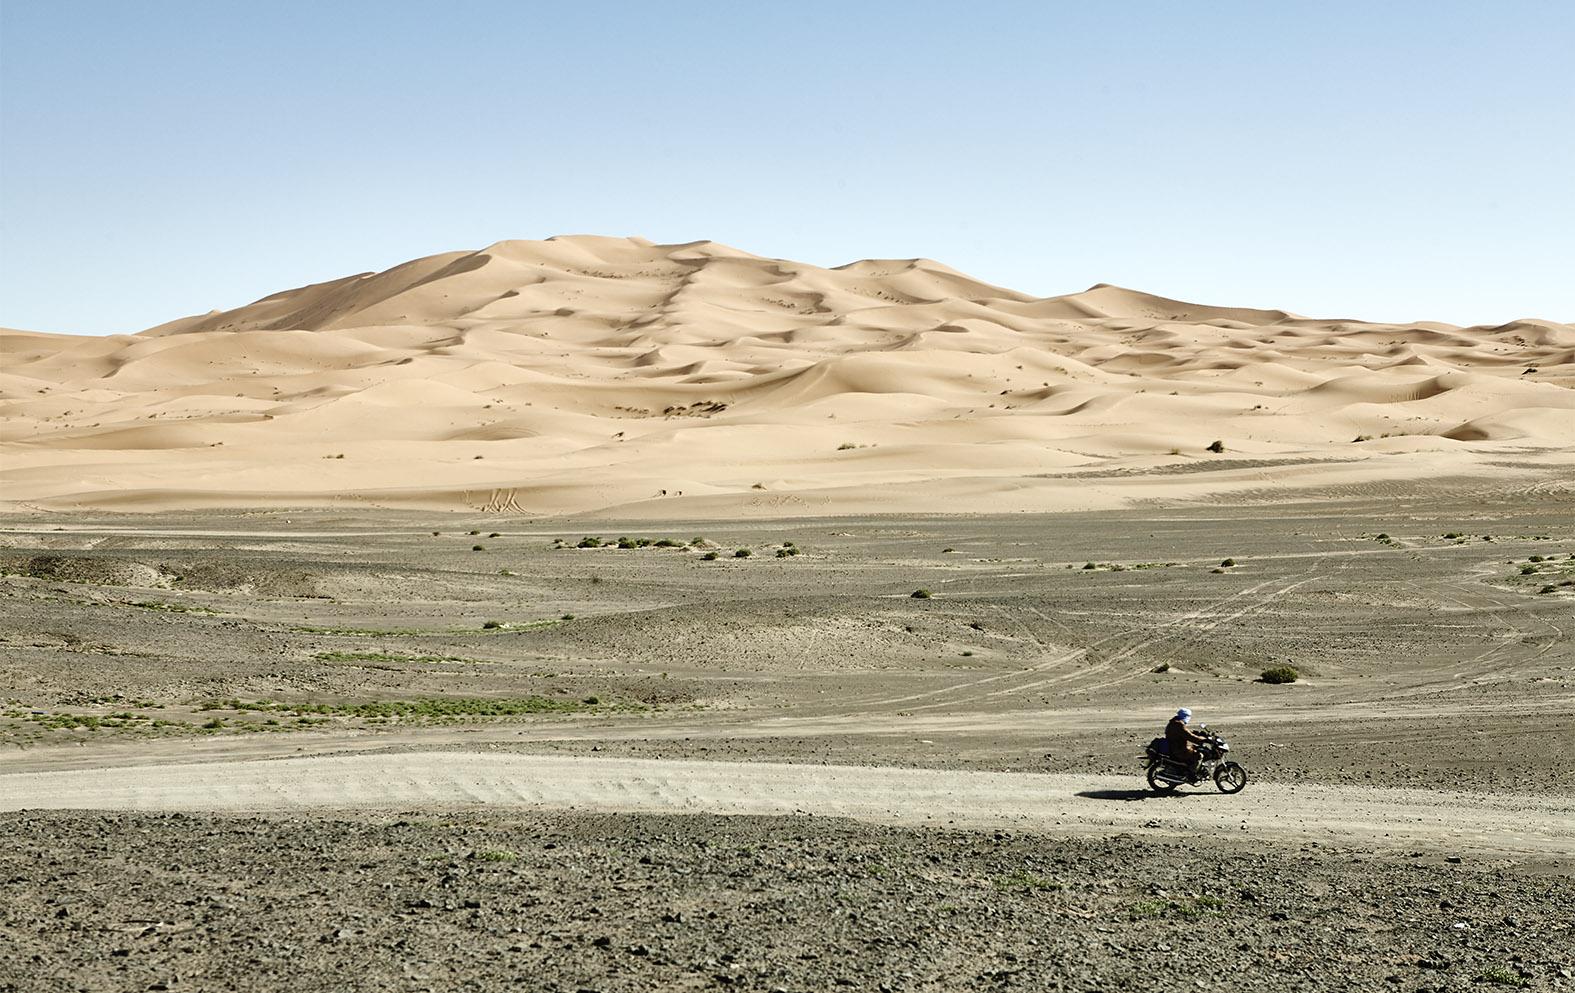 THE ROAD THE DESERT - MOROCCO